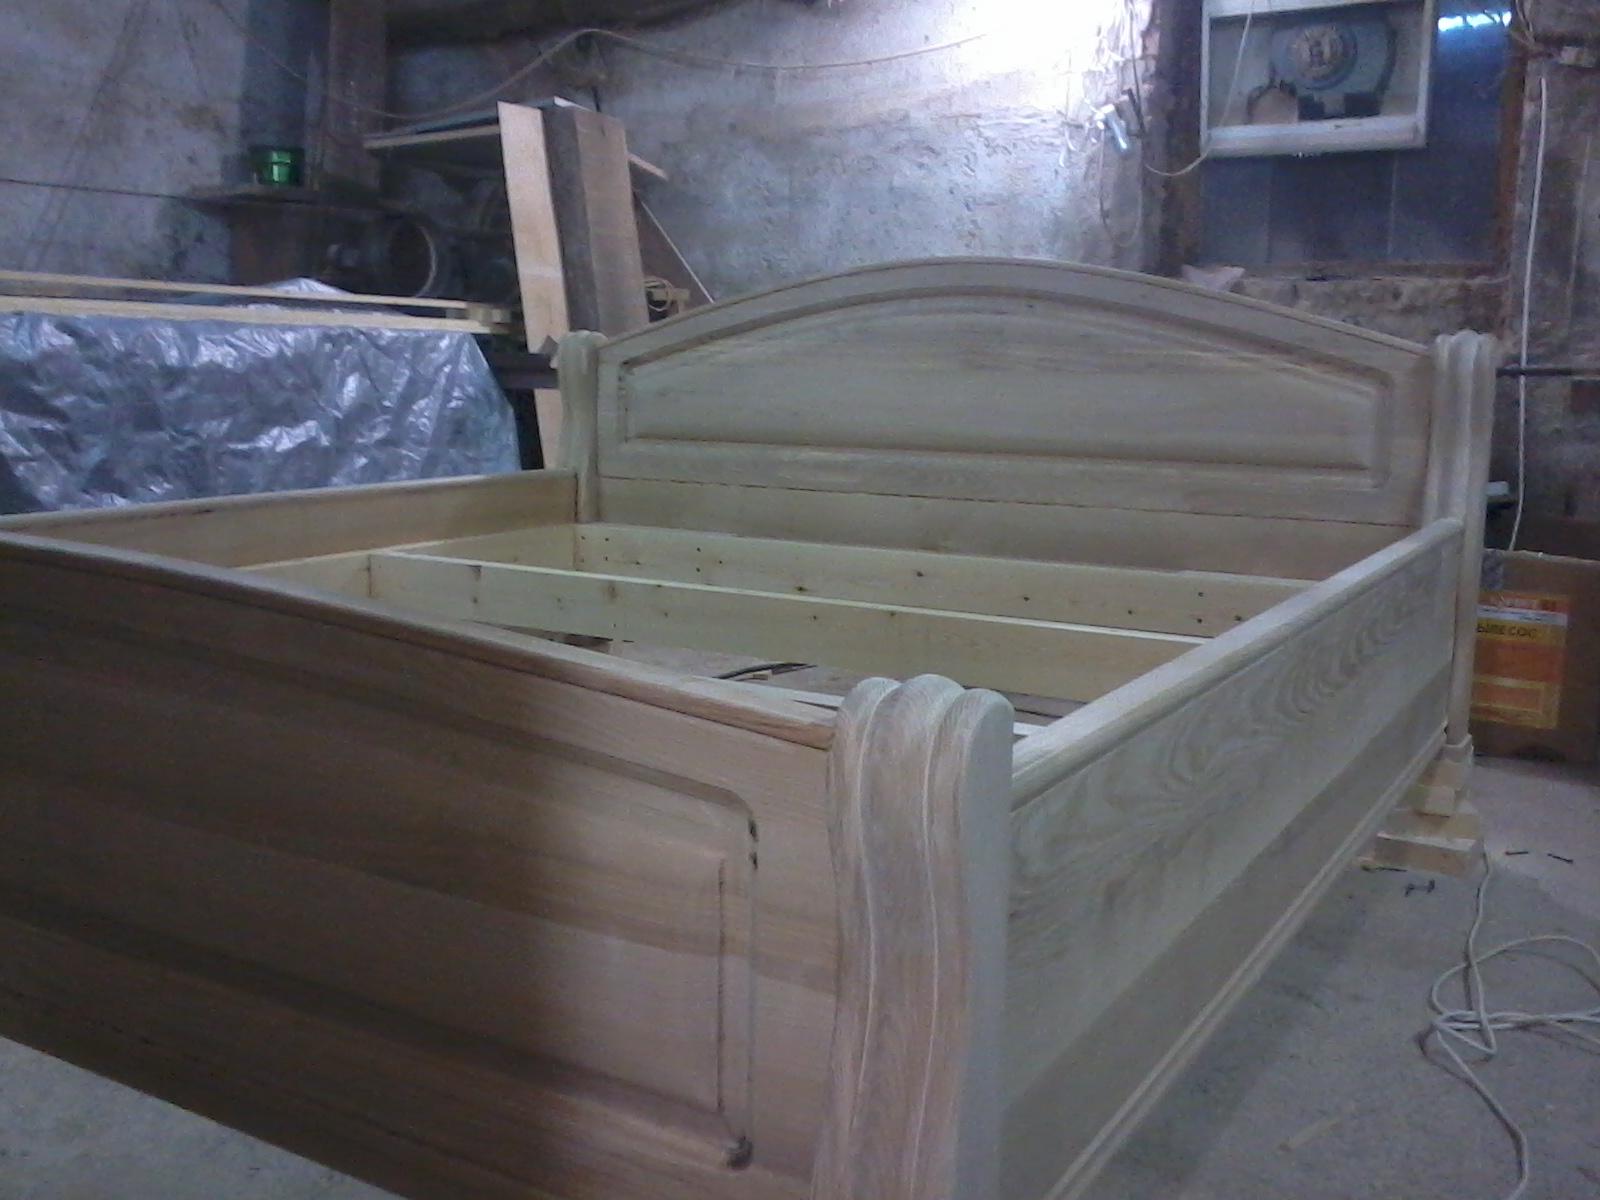 мебель - спальни - кровати в Кропоткине, Сочи